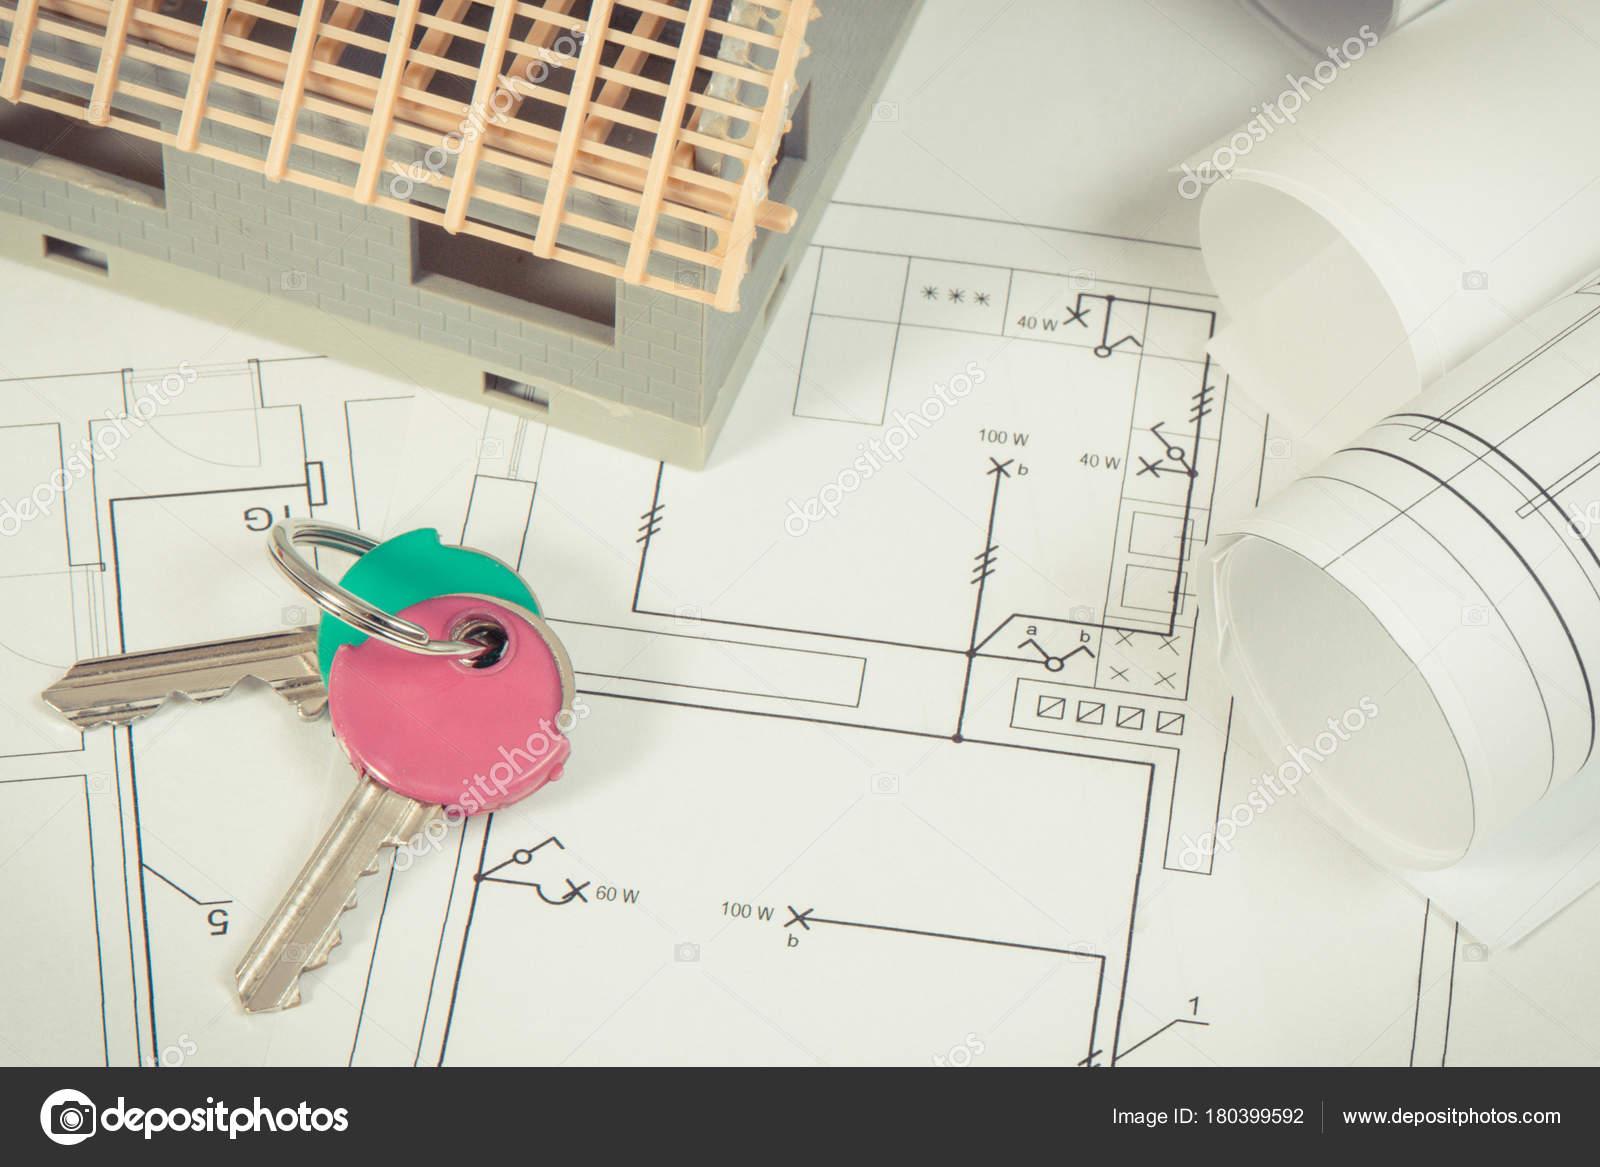 Schemi Elettrici Casa : Chiavi di casa casa in costruzione e schemi elettrici per lavori in